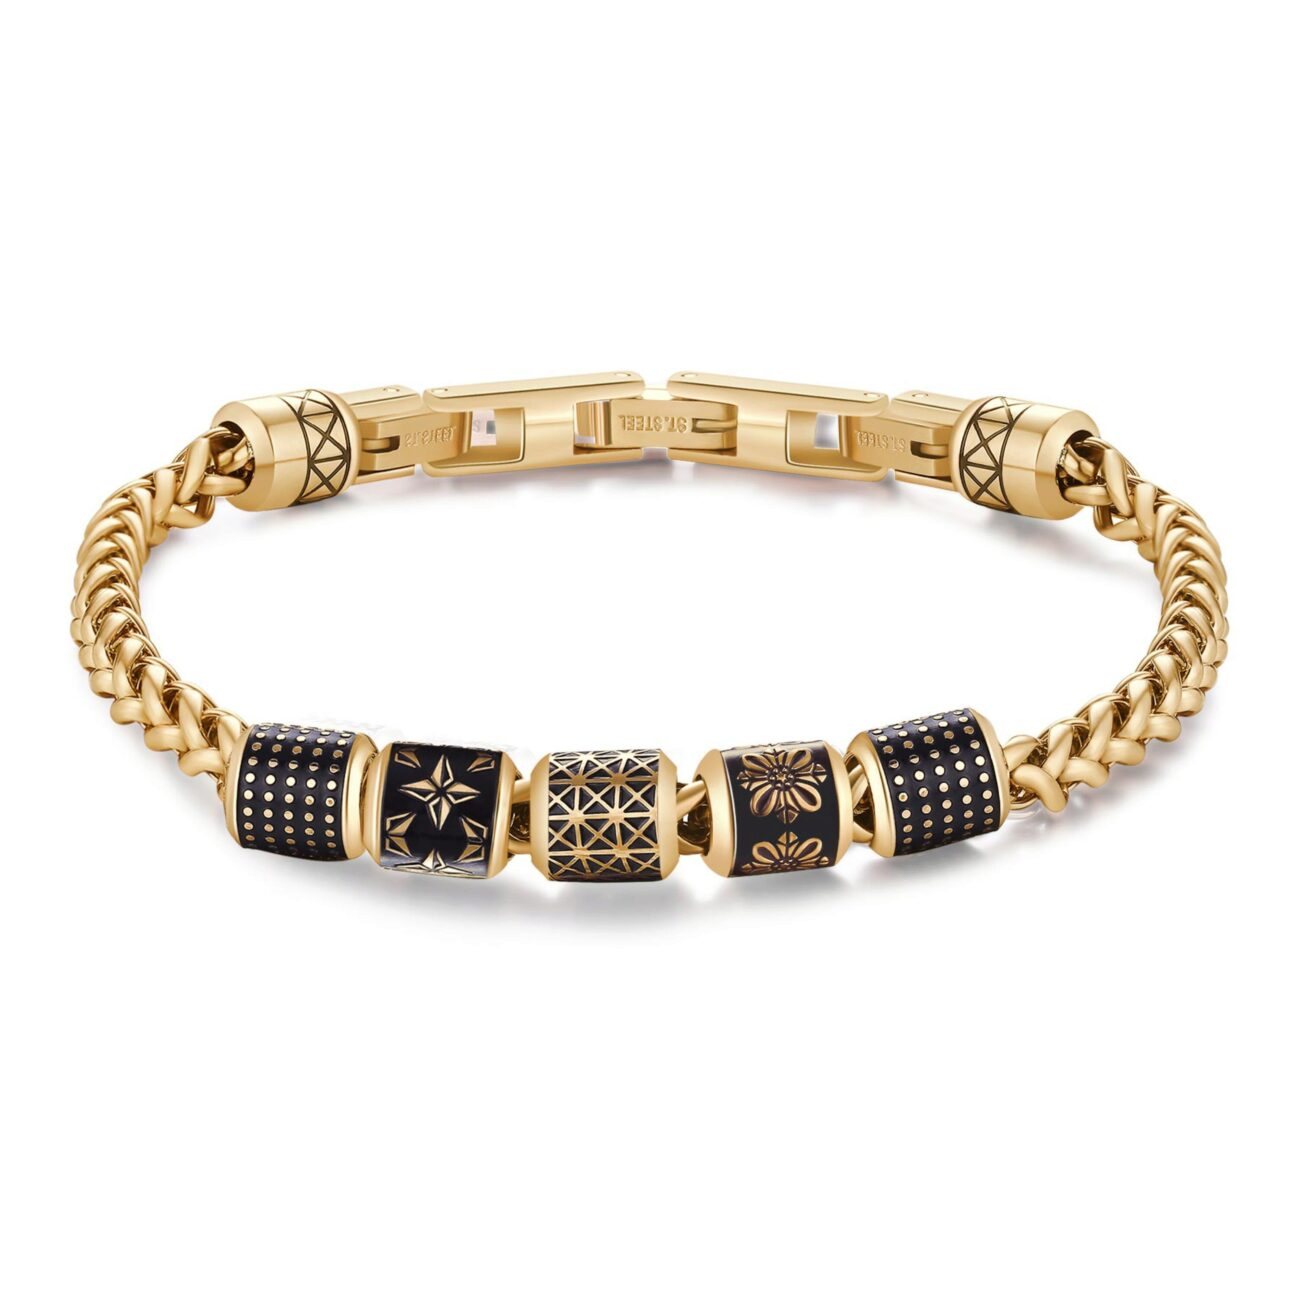 316L stainless steel bracelet, gold pvd with black enamel.